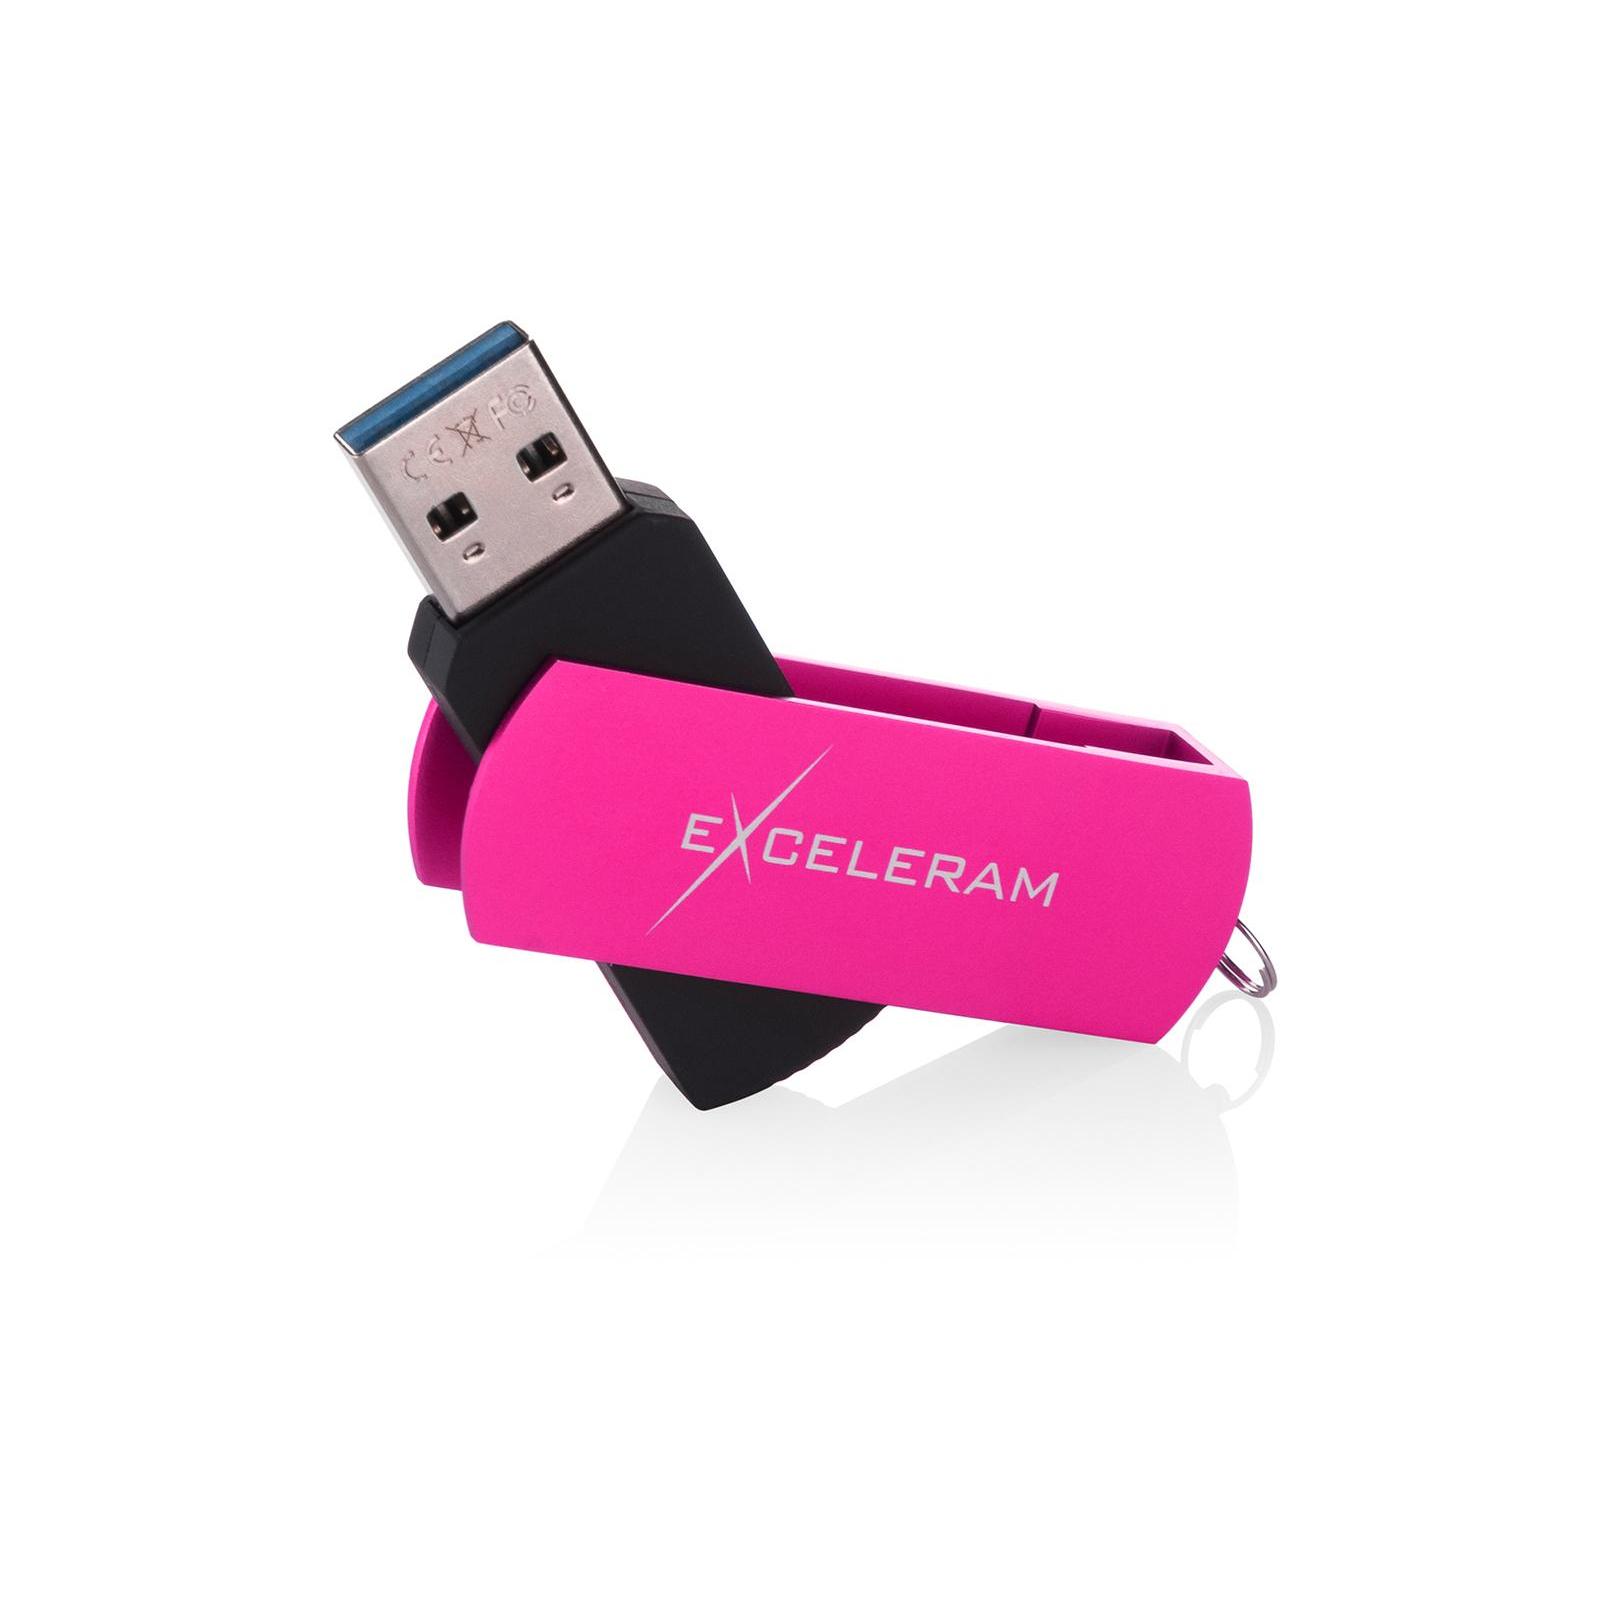 USB флеш накопитель eXceleram 32GB P2 Series Black/Black USB 3.1 Gen 1 (EXP2U3BB32) изображение 3